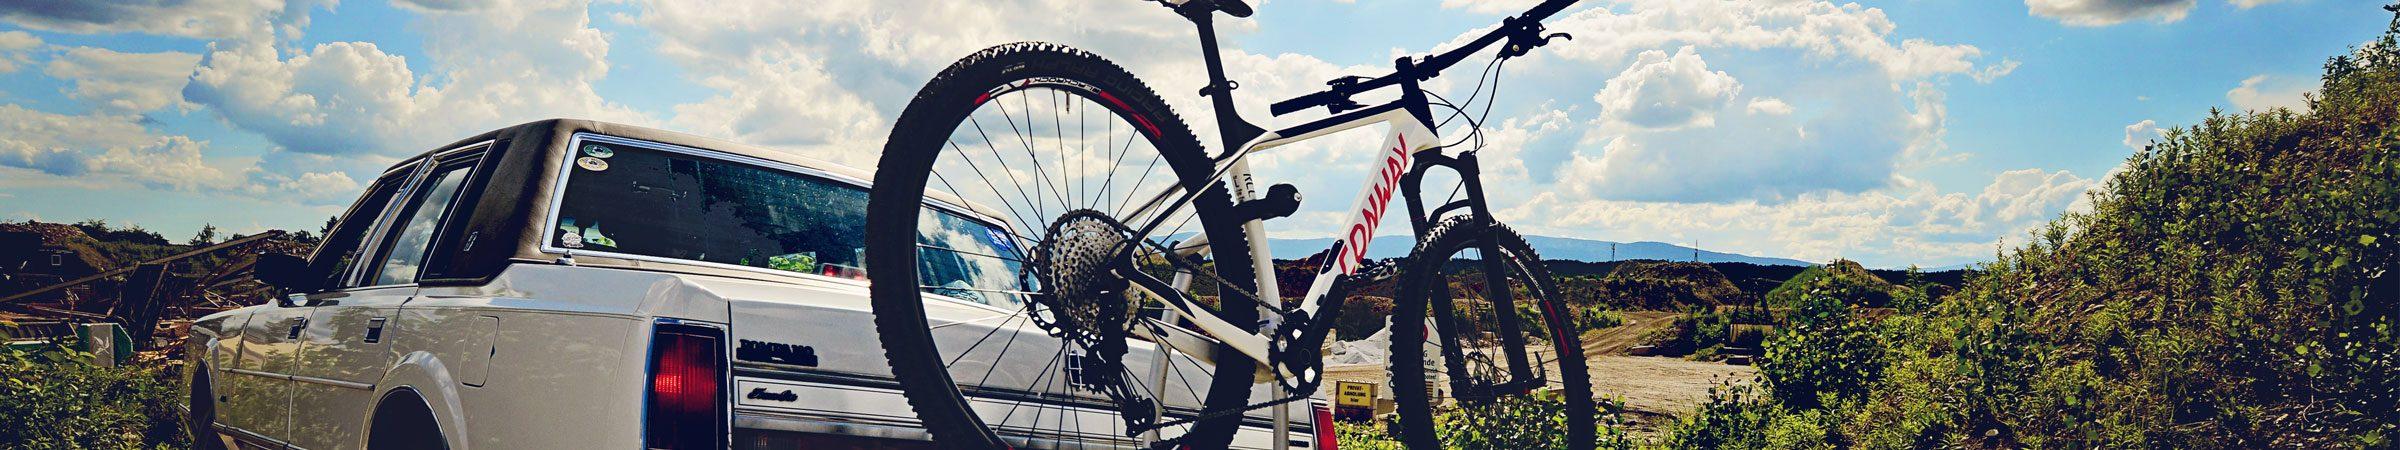 car-bike-header-1